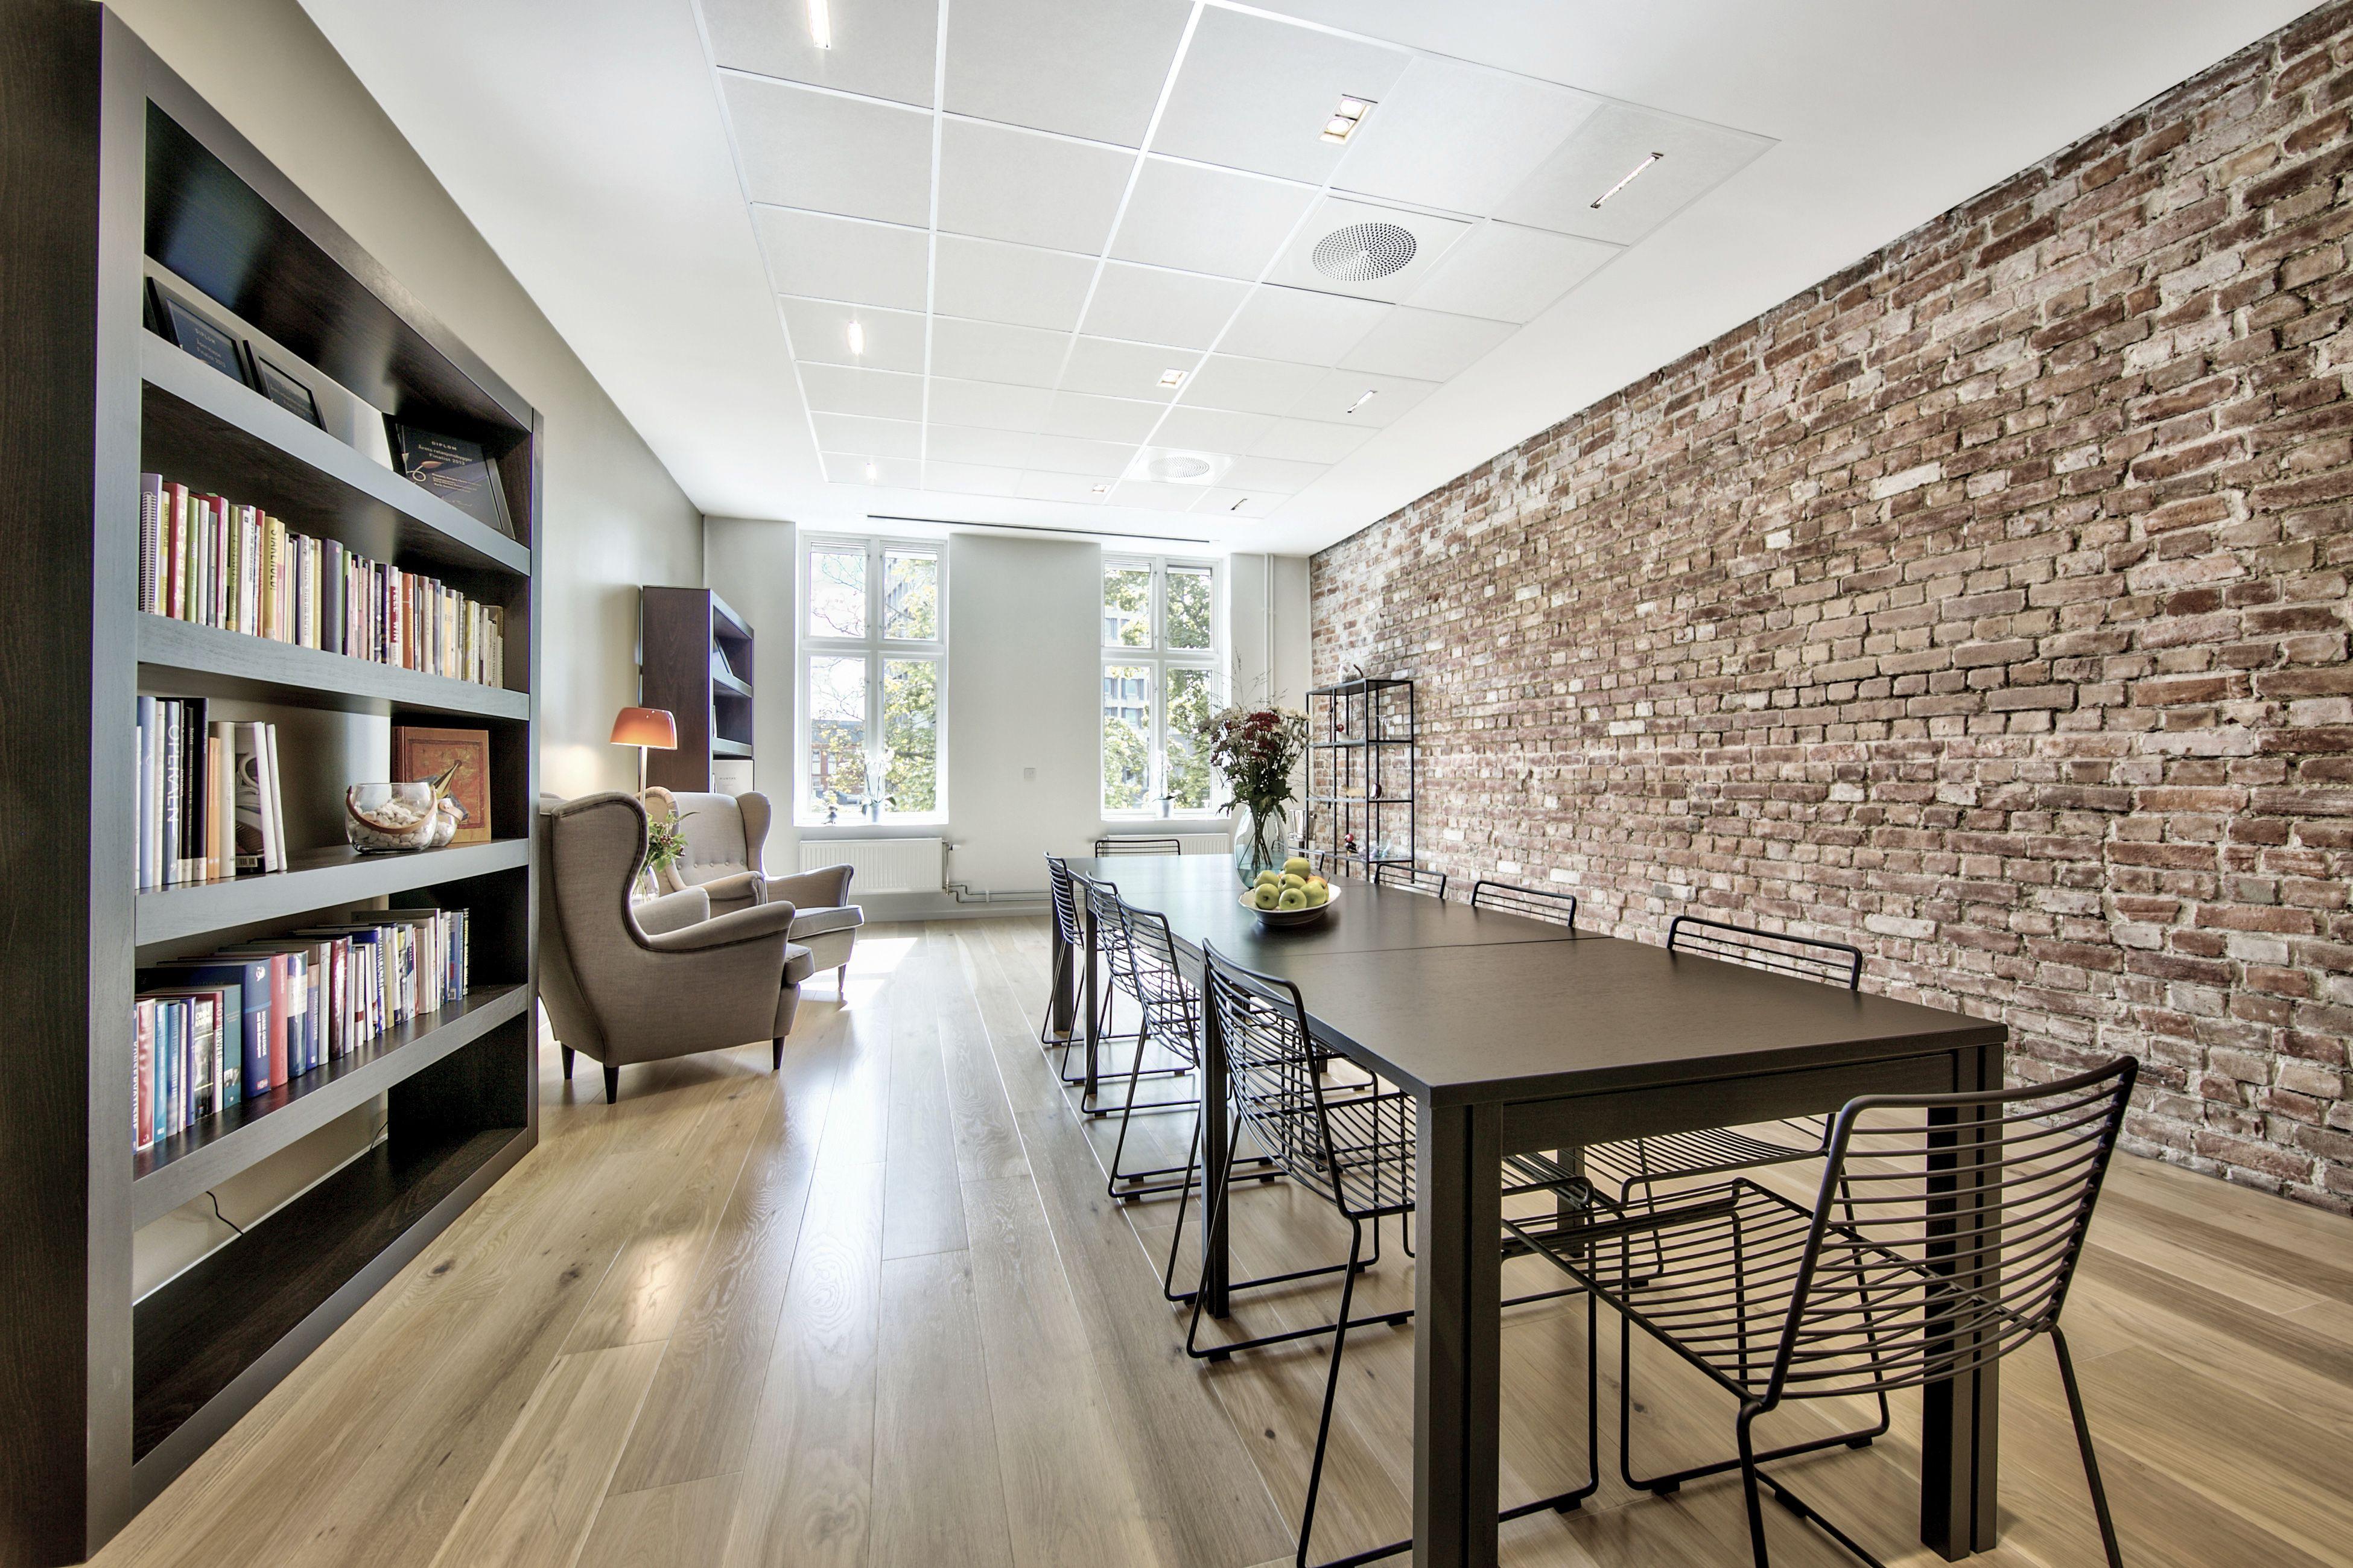 sommerrogaten - designednorwegian interior architect firm